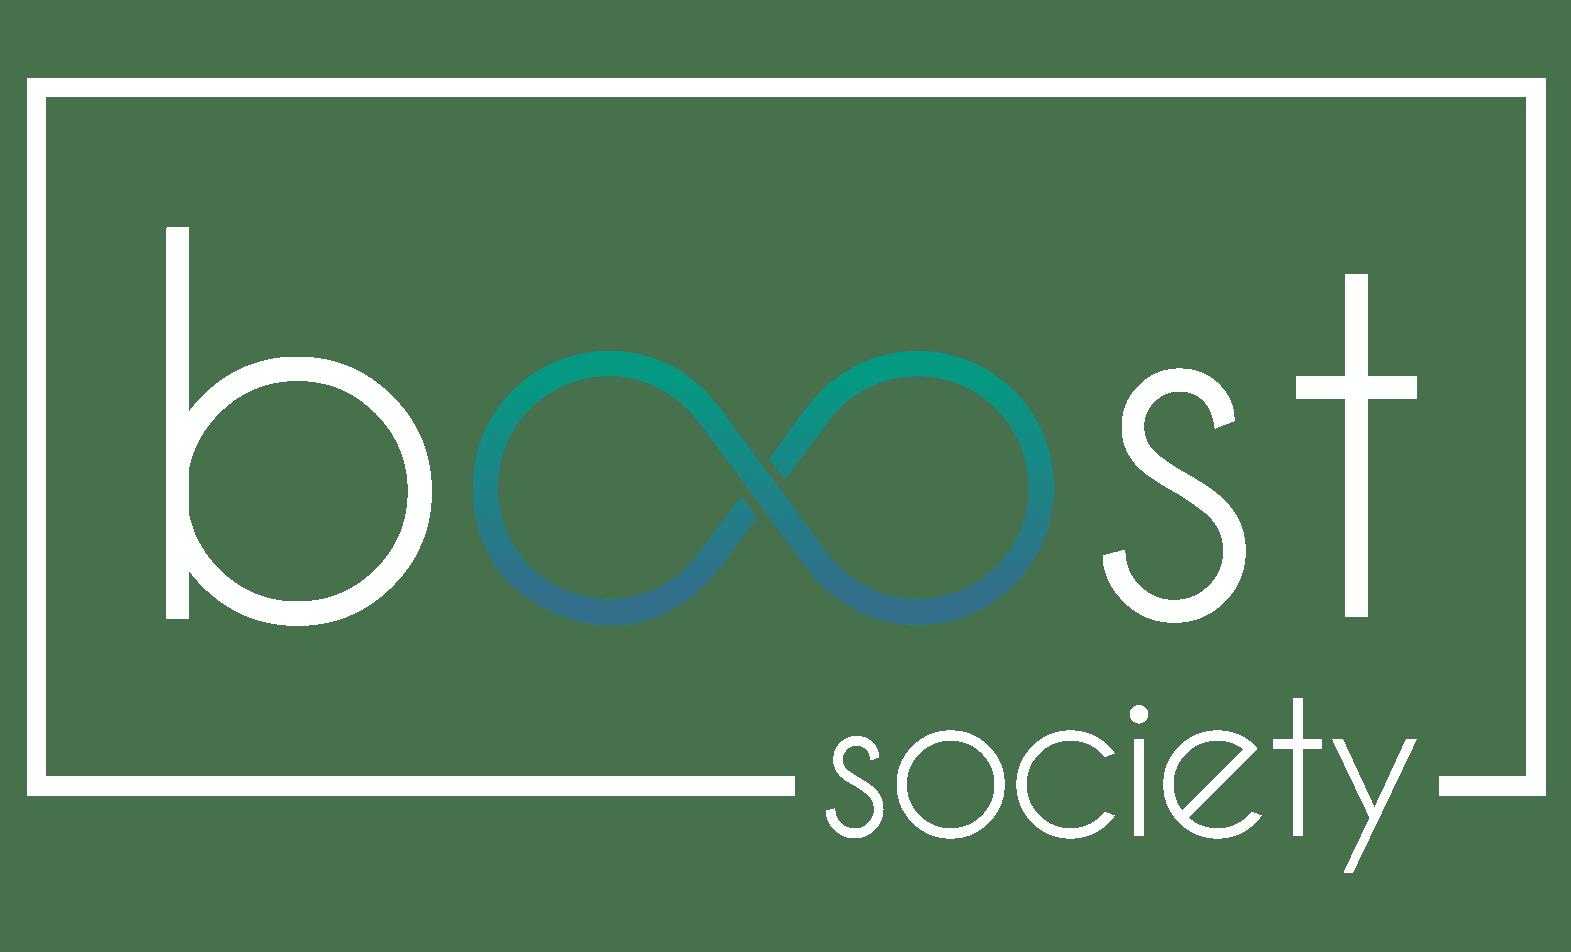 Boost Society